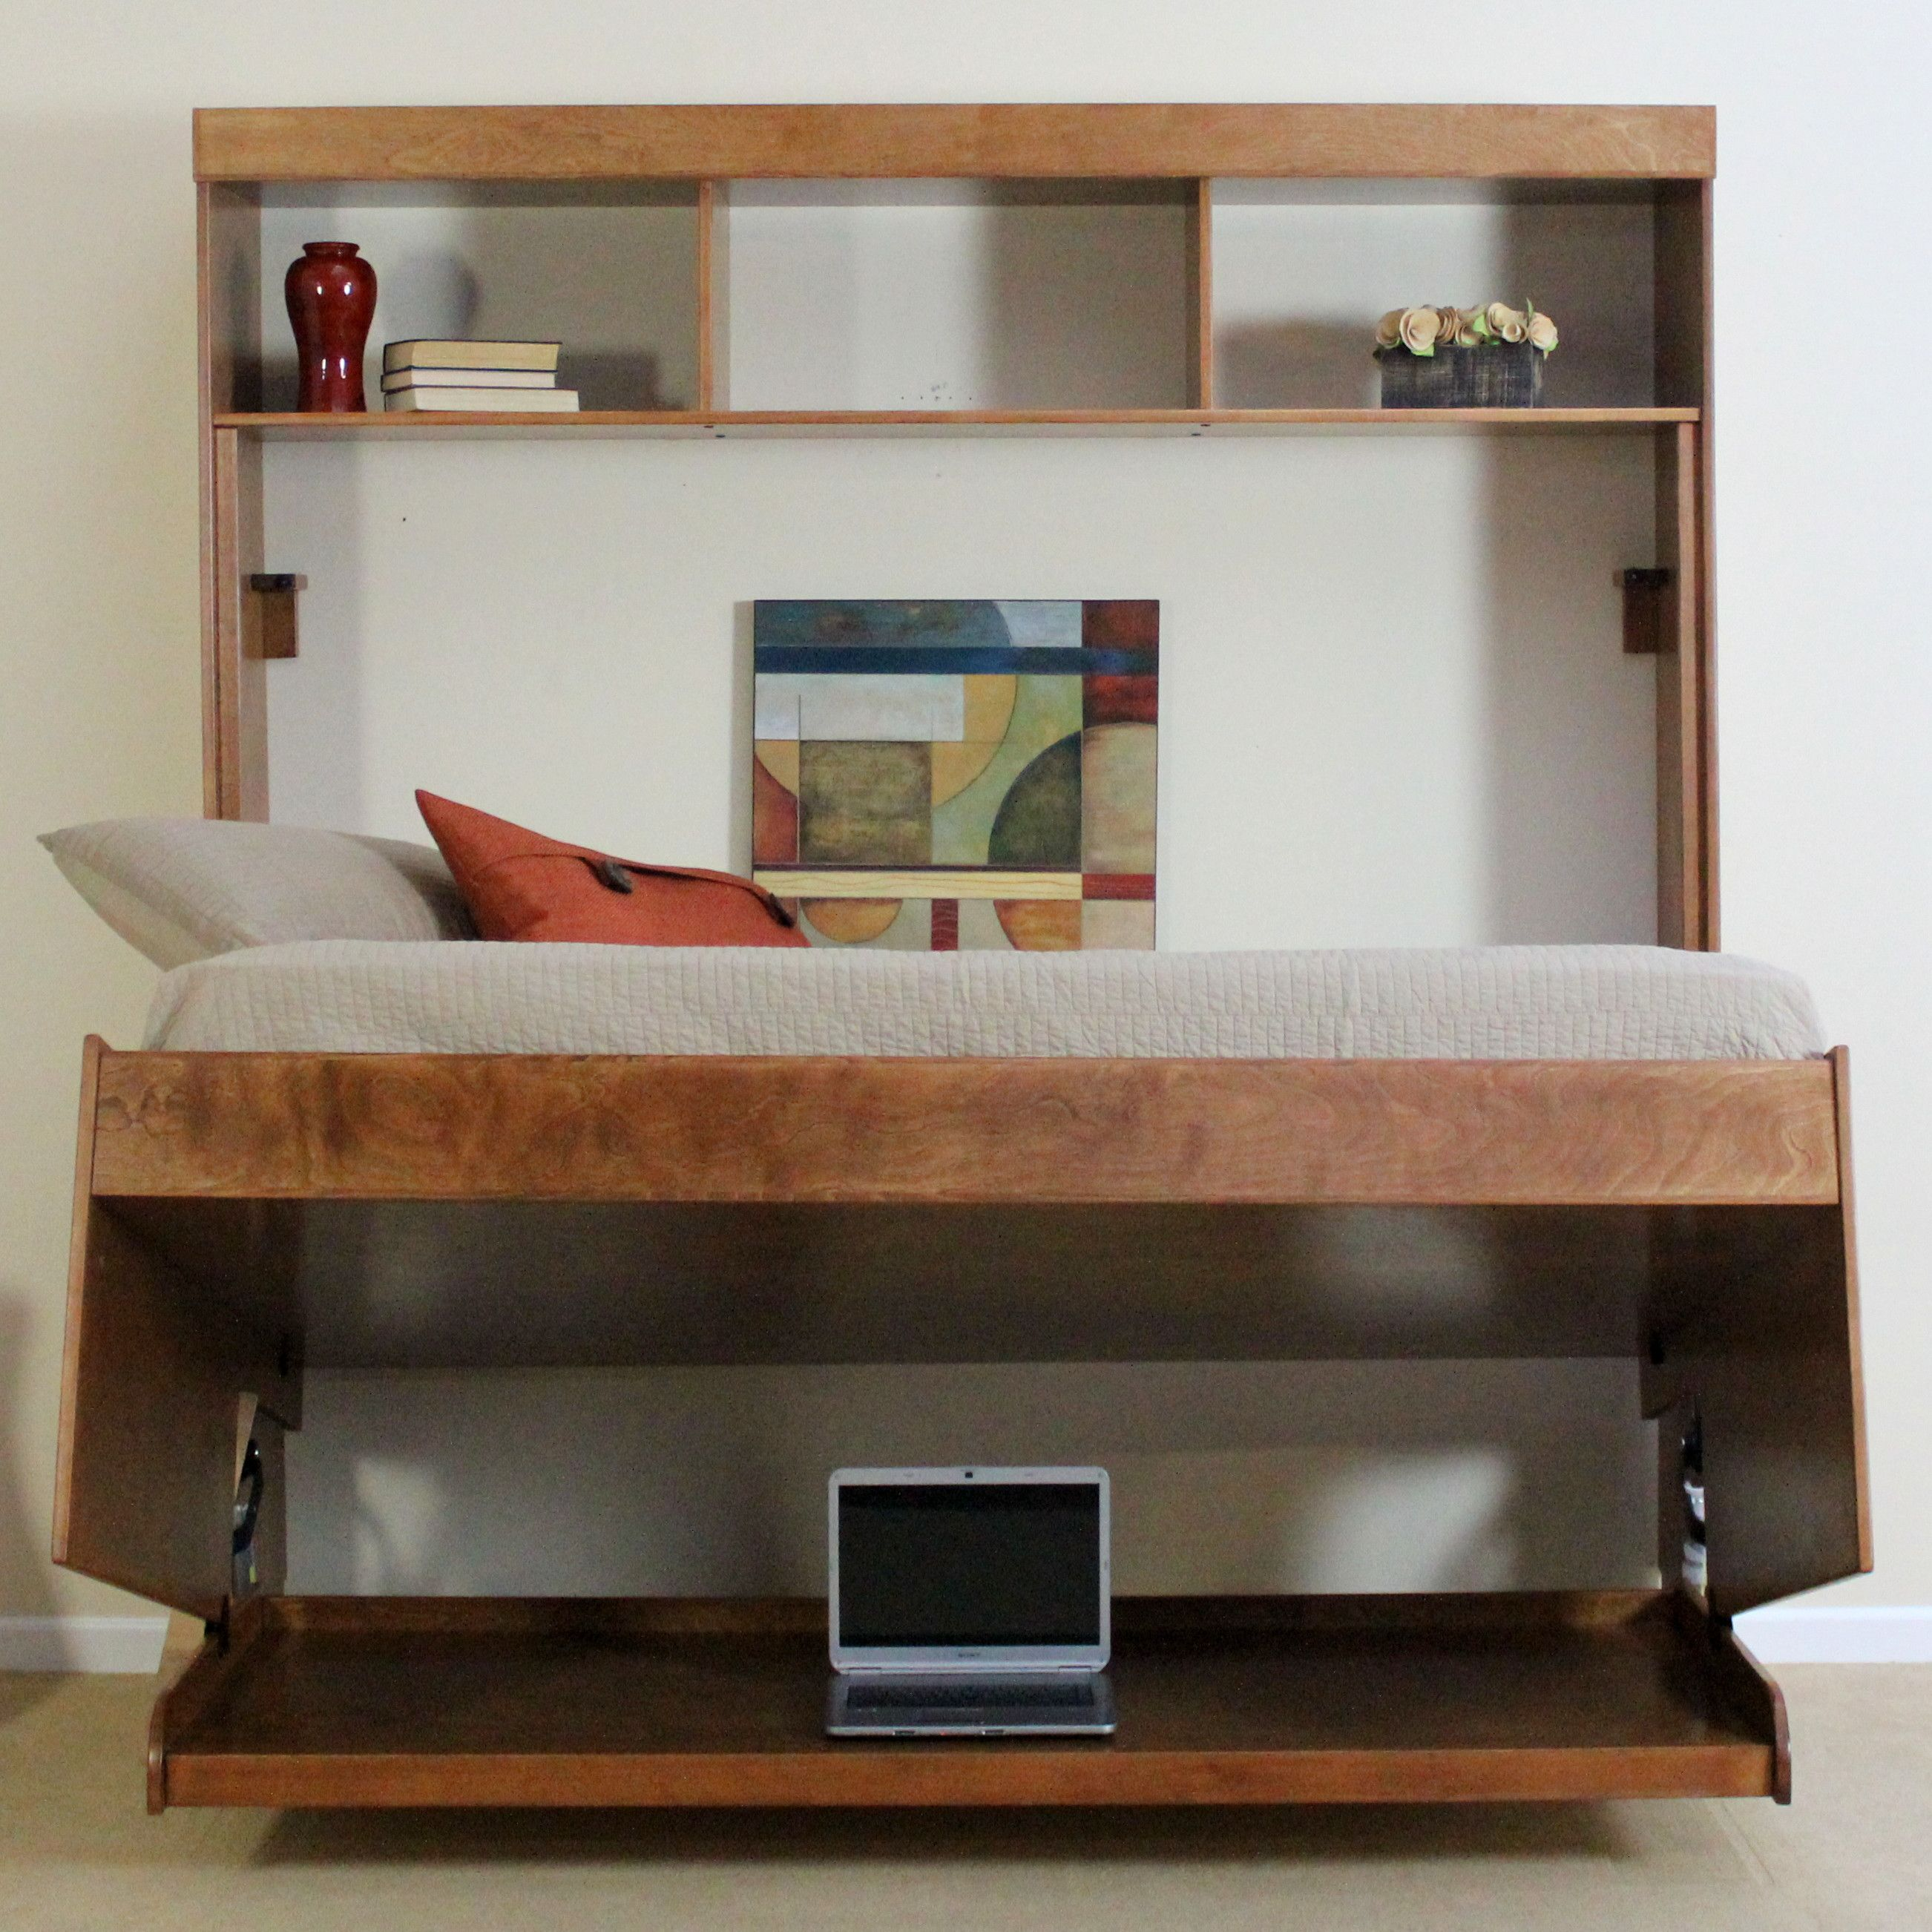 Customer Image Zoomed Murphy bed desk, Murphy bed diy